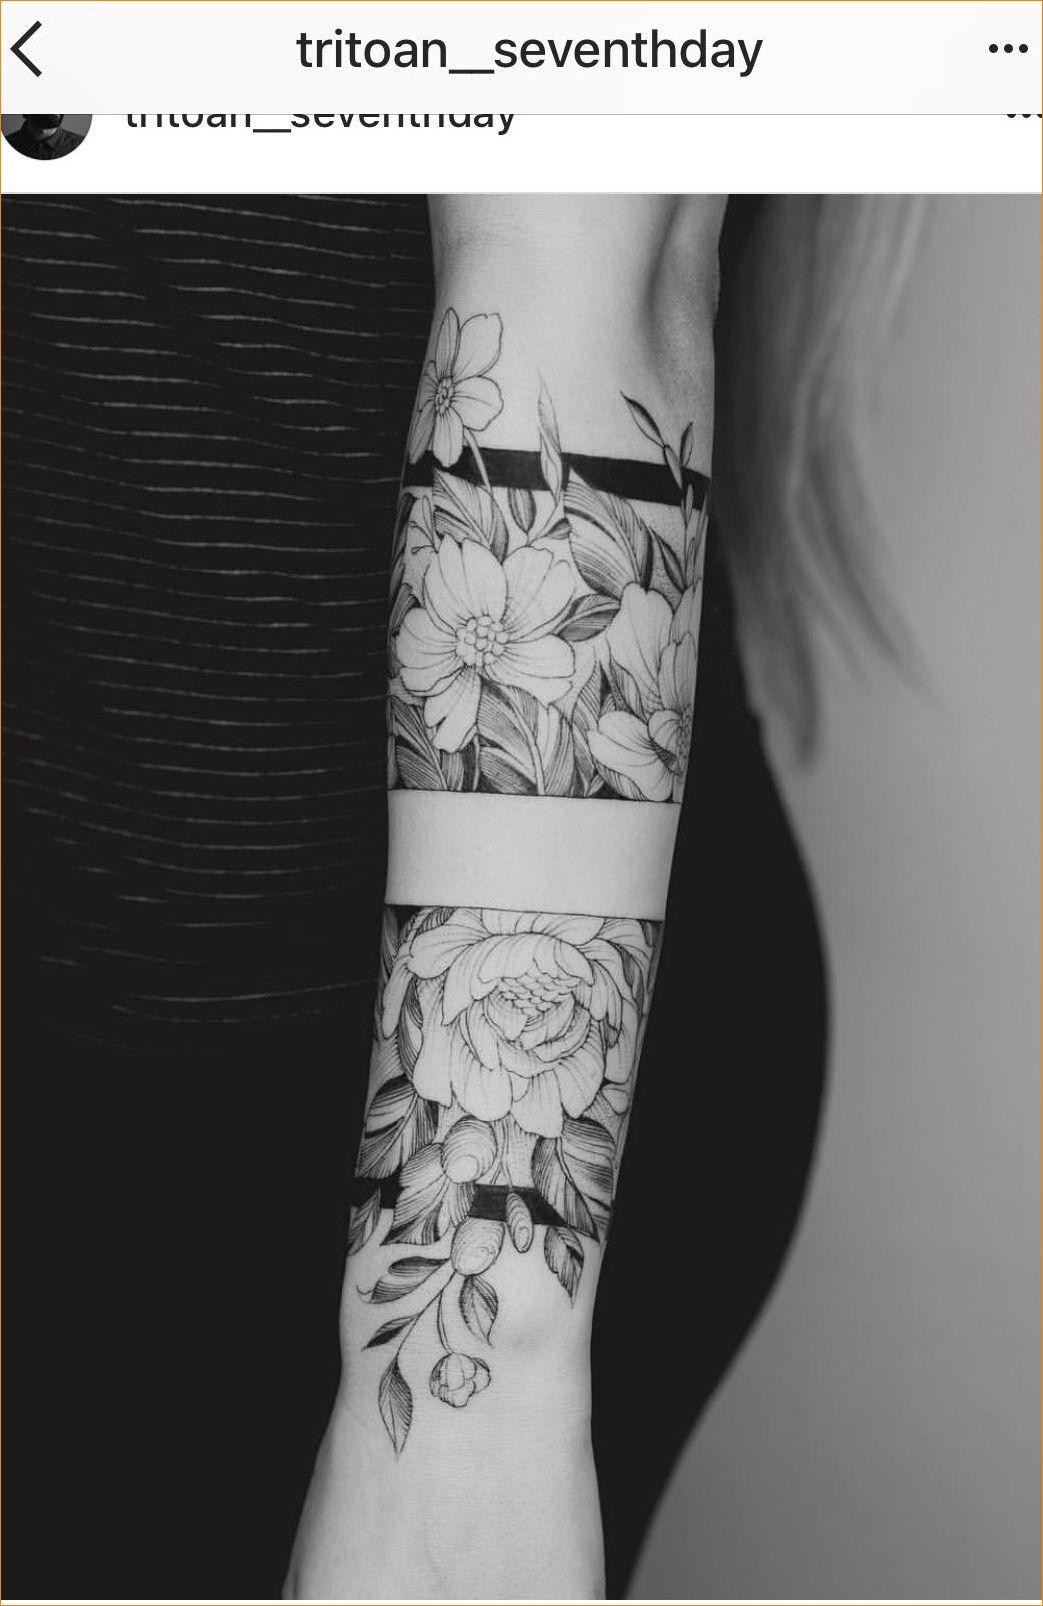 Photo of Pin by Mxxriona Kppn on Tattoo ideas | Pinterest | Tattoo designs ༆